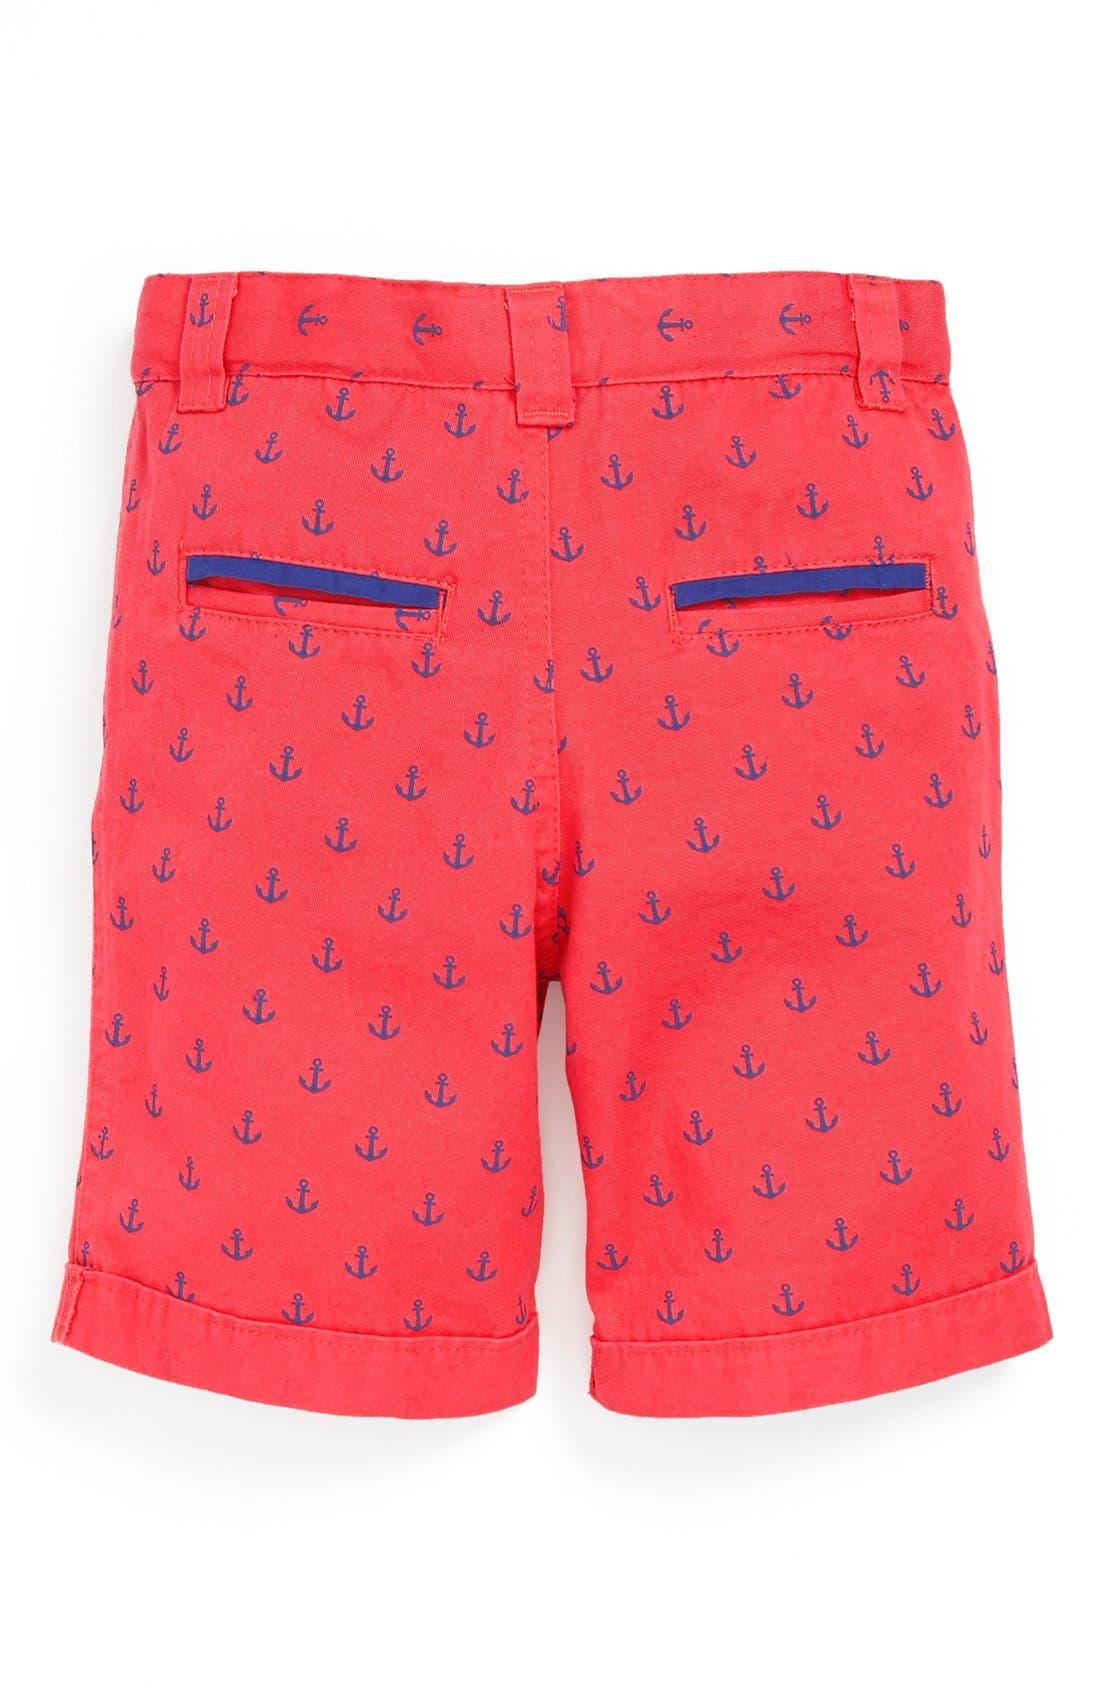 Alternate Image 2  - Sovereign Code 'Starboard' Shorts (Baby Boys)